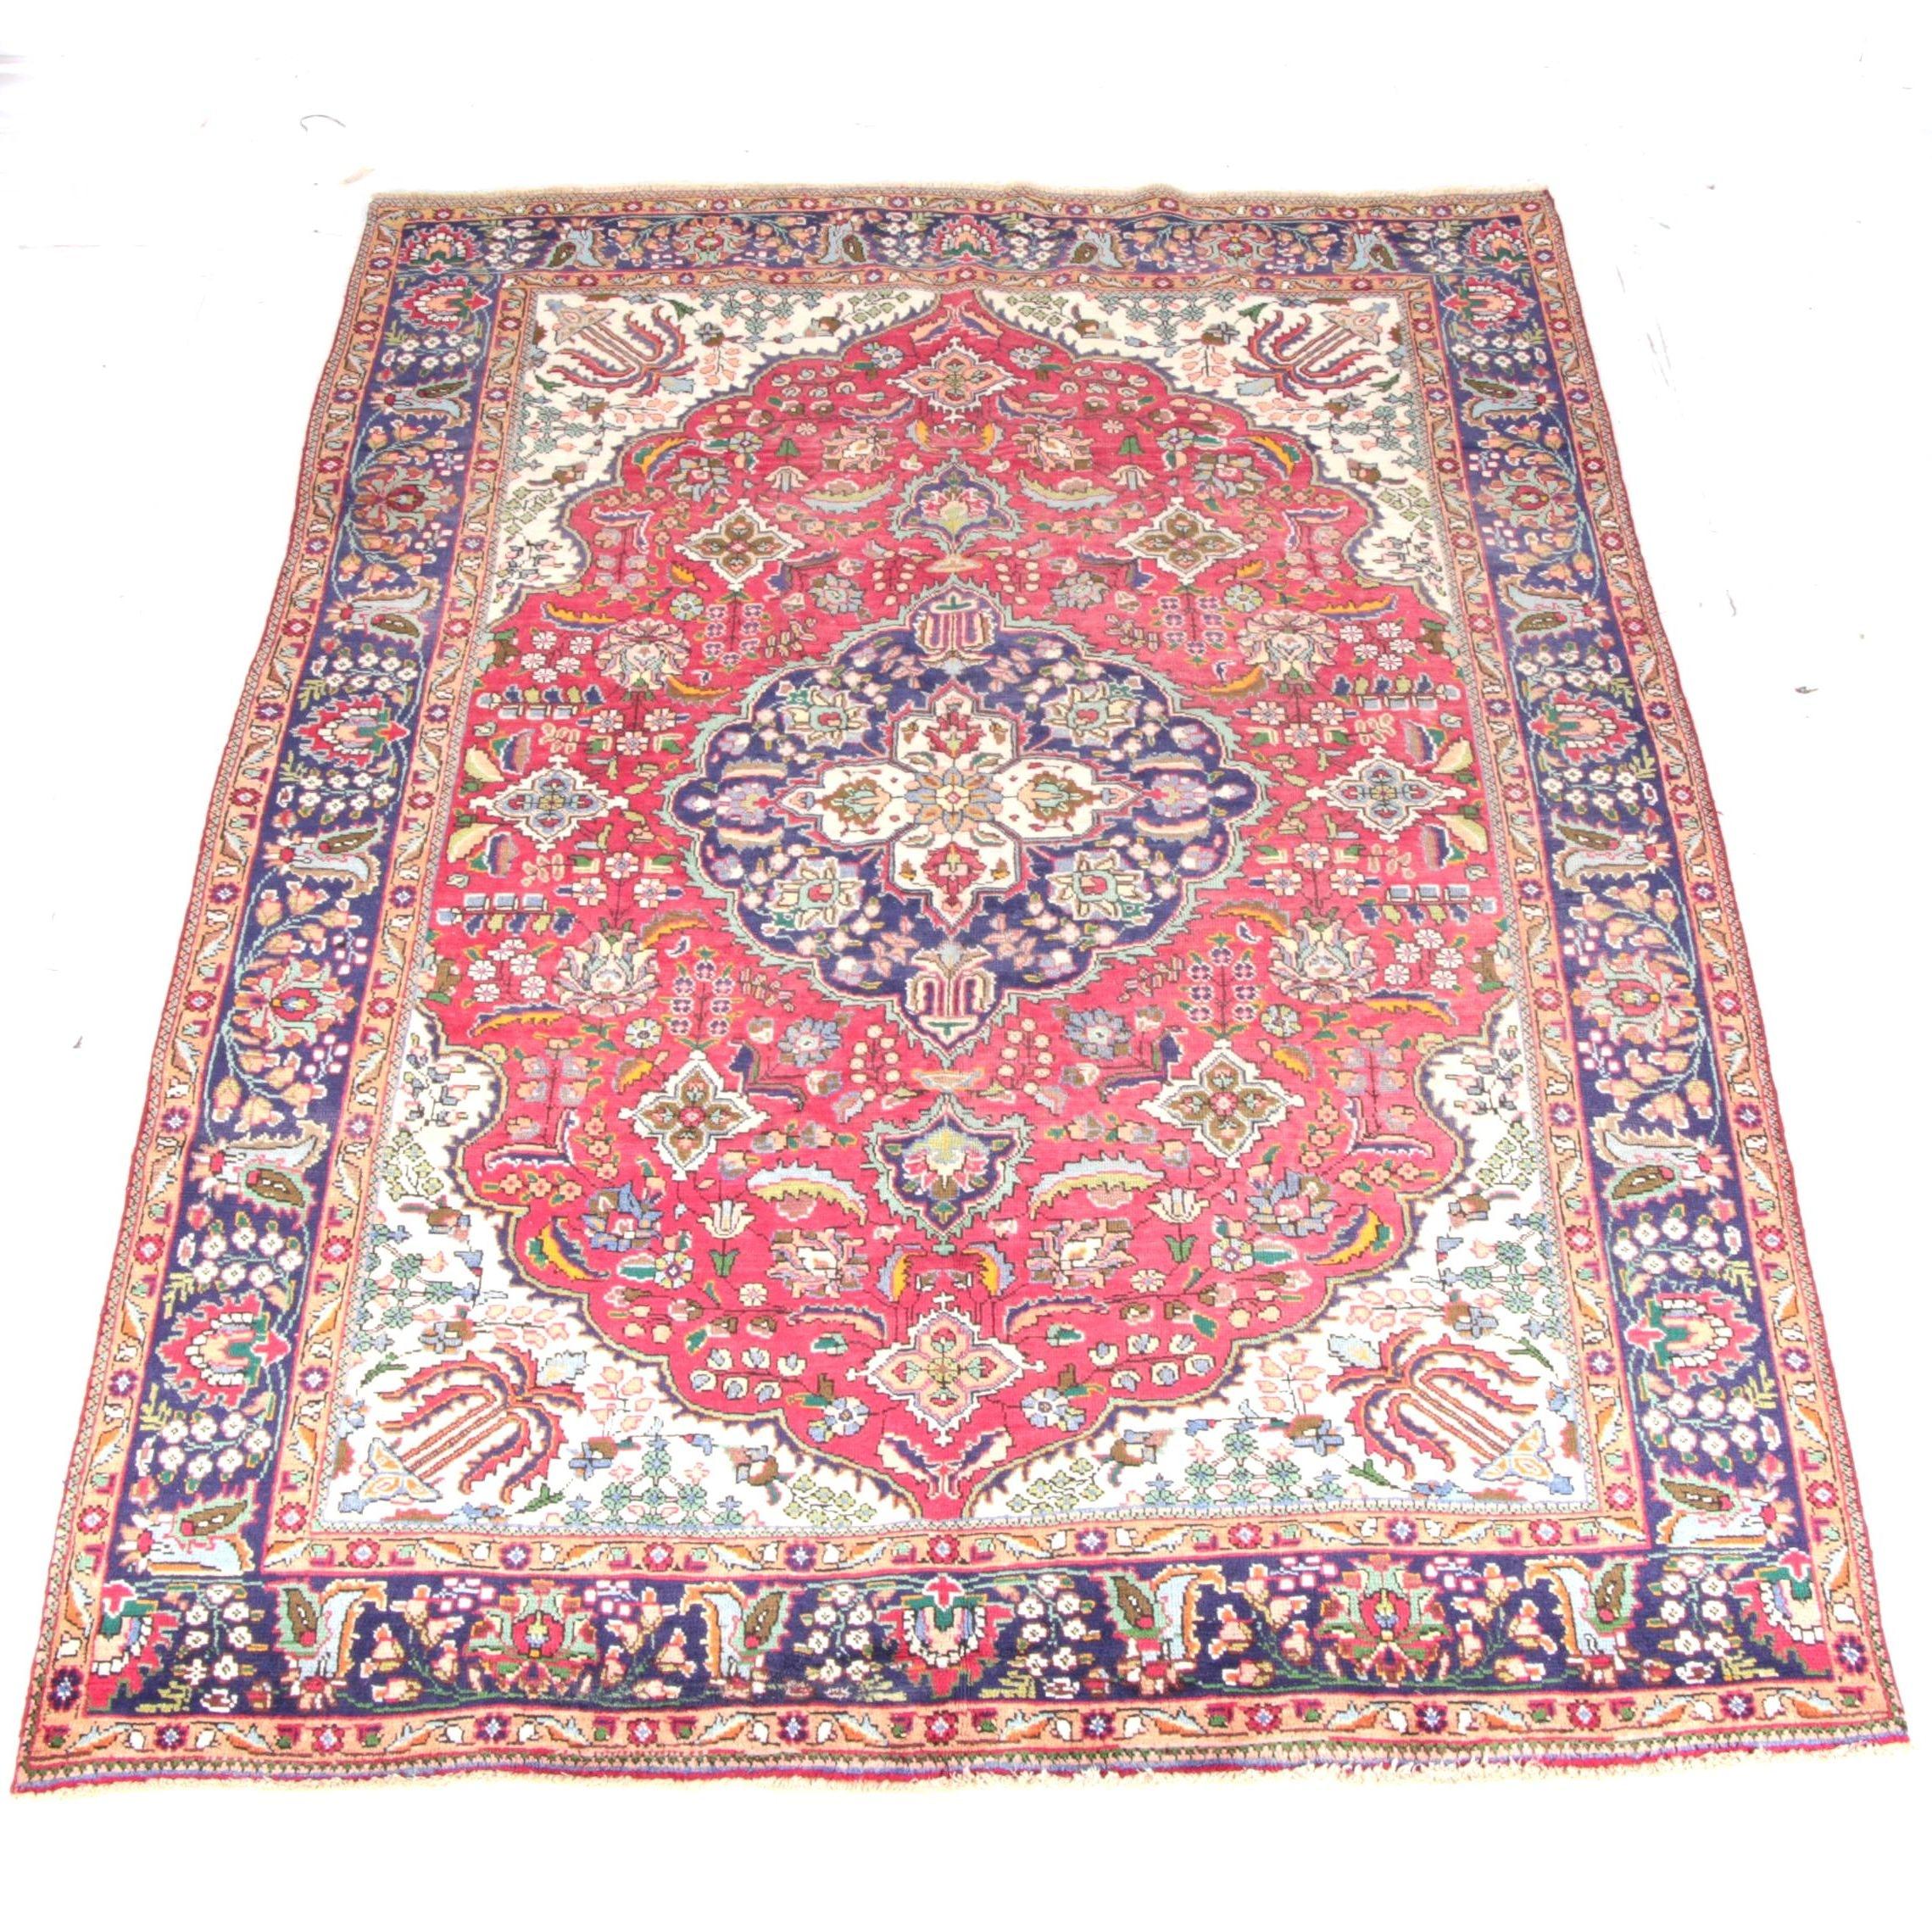 Handwoven Semi-Antique Persian Hajjalili Tabriz Wool Area Rug